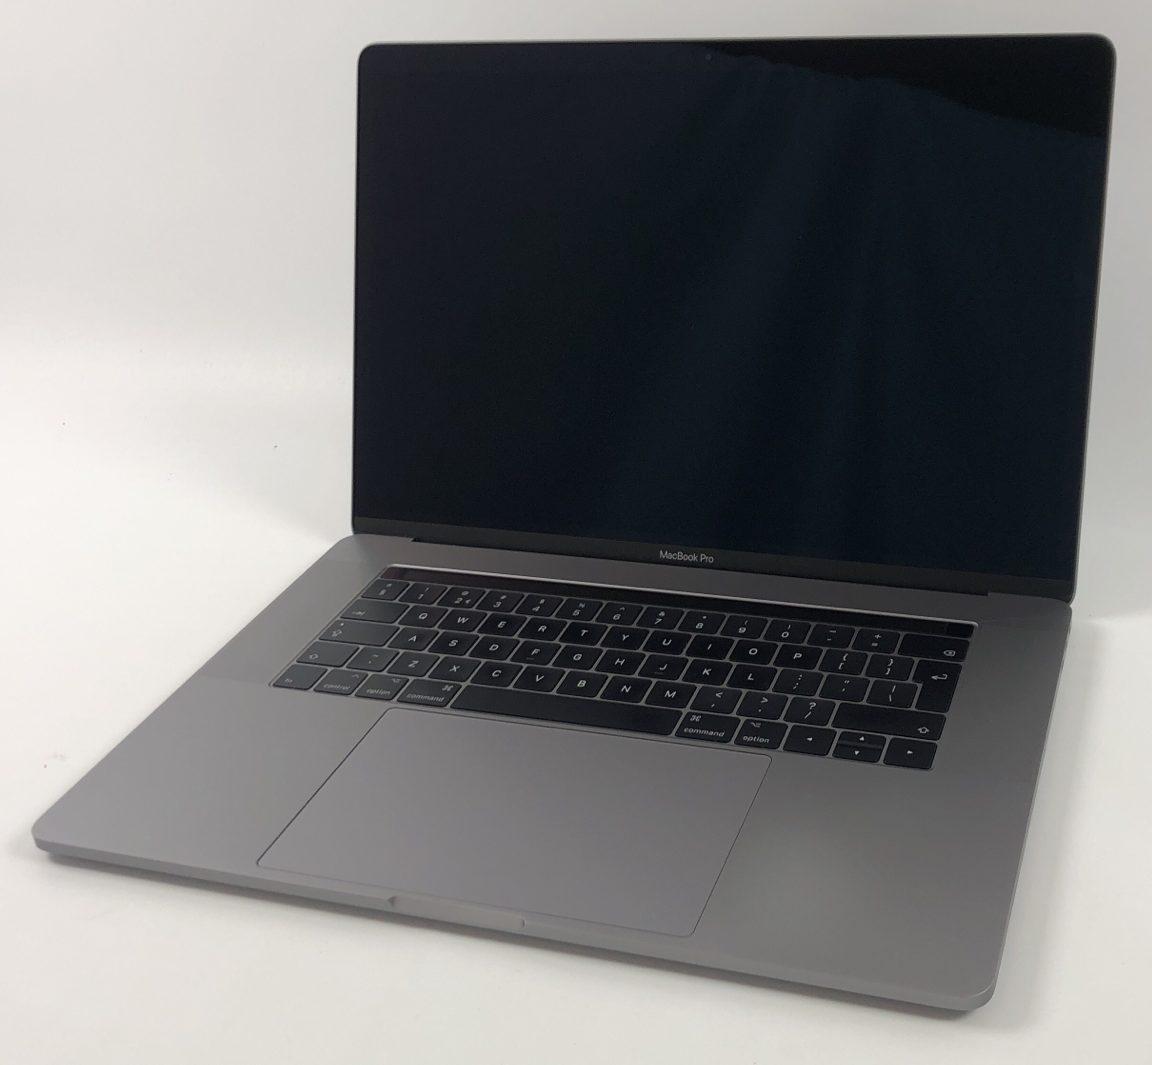 "MacBook Pro 15"" Touch Bar Late 2016 (Intel Quad-Core i7 2.7 GHz 16 GB RAM 512 GB SSD), Space Gray, Intel Quad-Core i7 2.7 GHz, 16 GB RAM, 512 GB SSD, image 1"